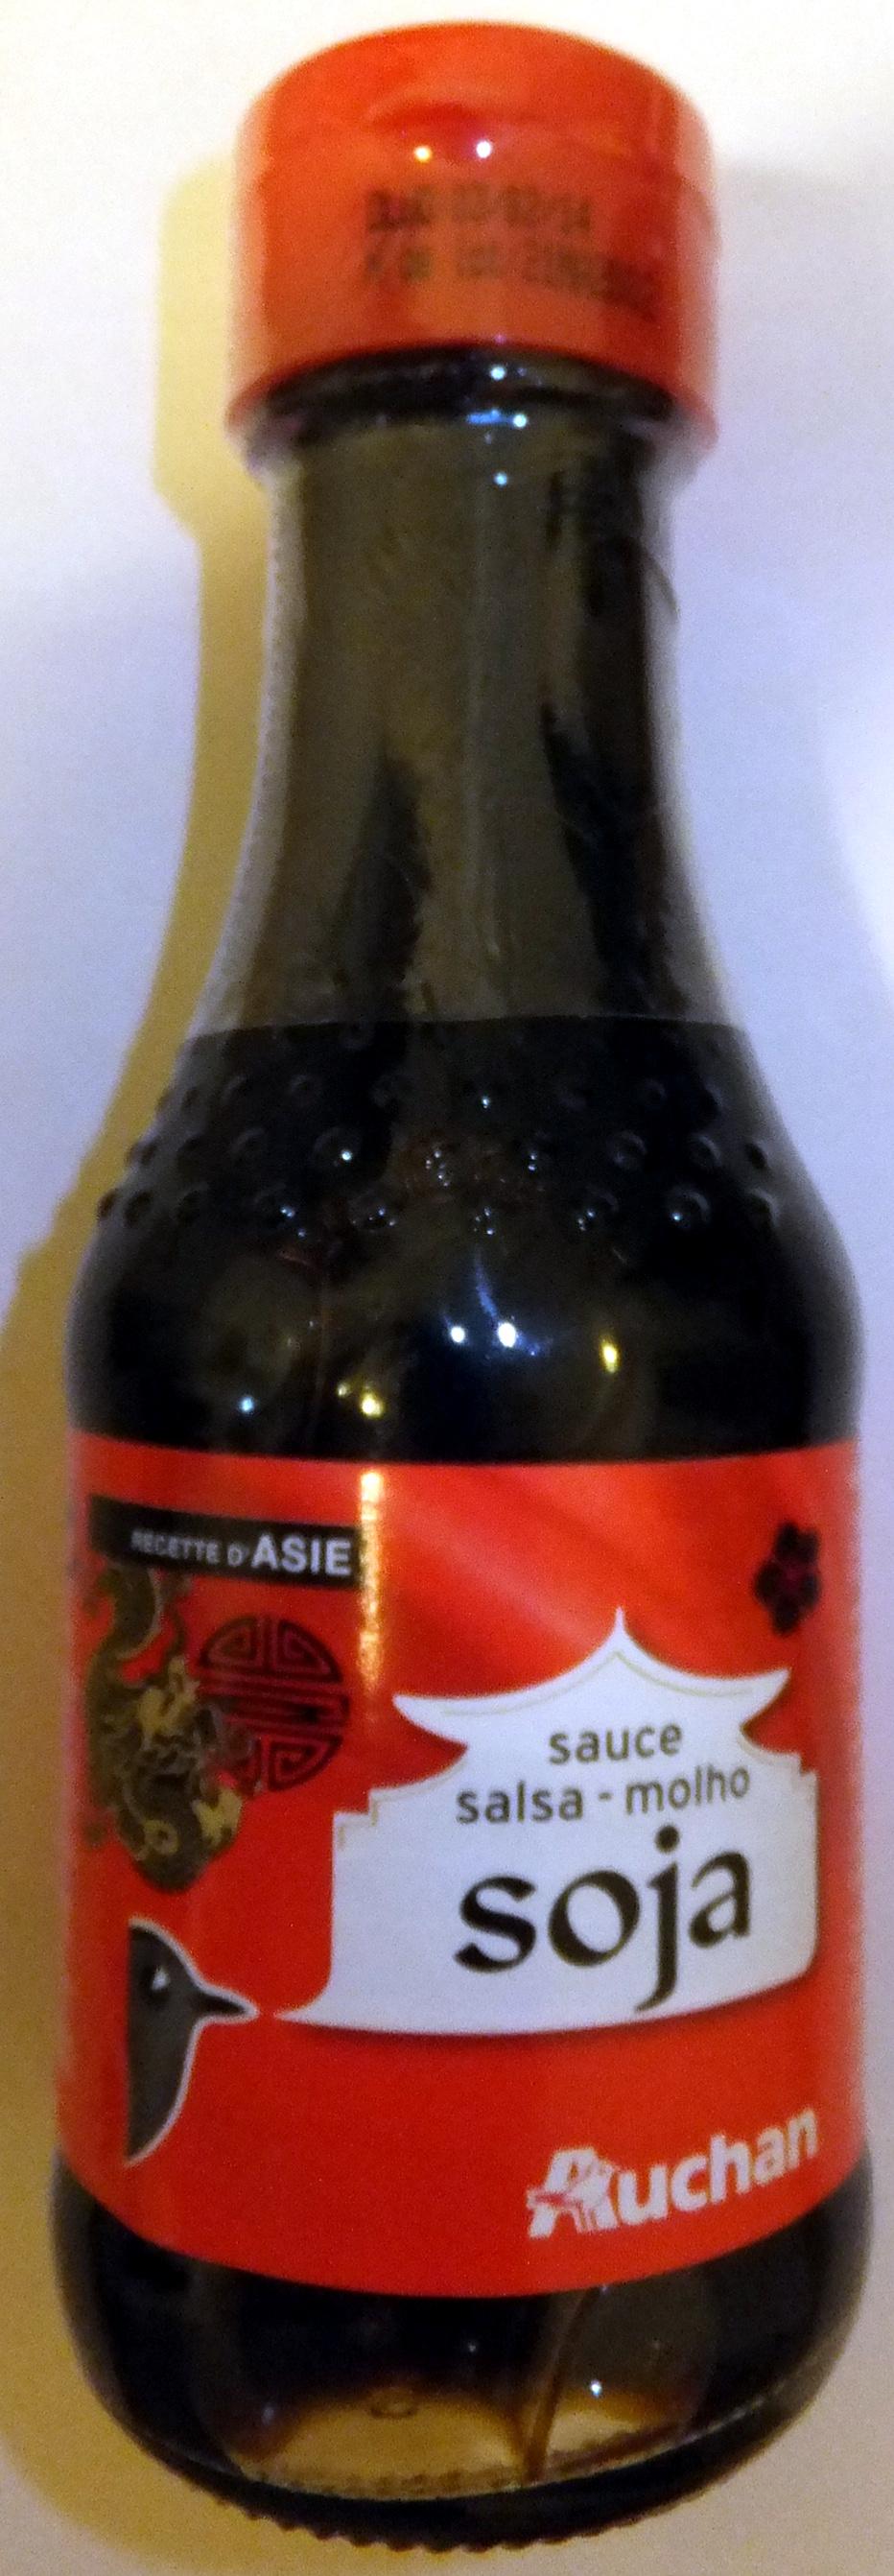 Sauce soja - Prodotto - fr